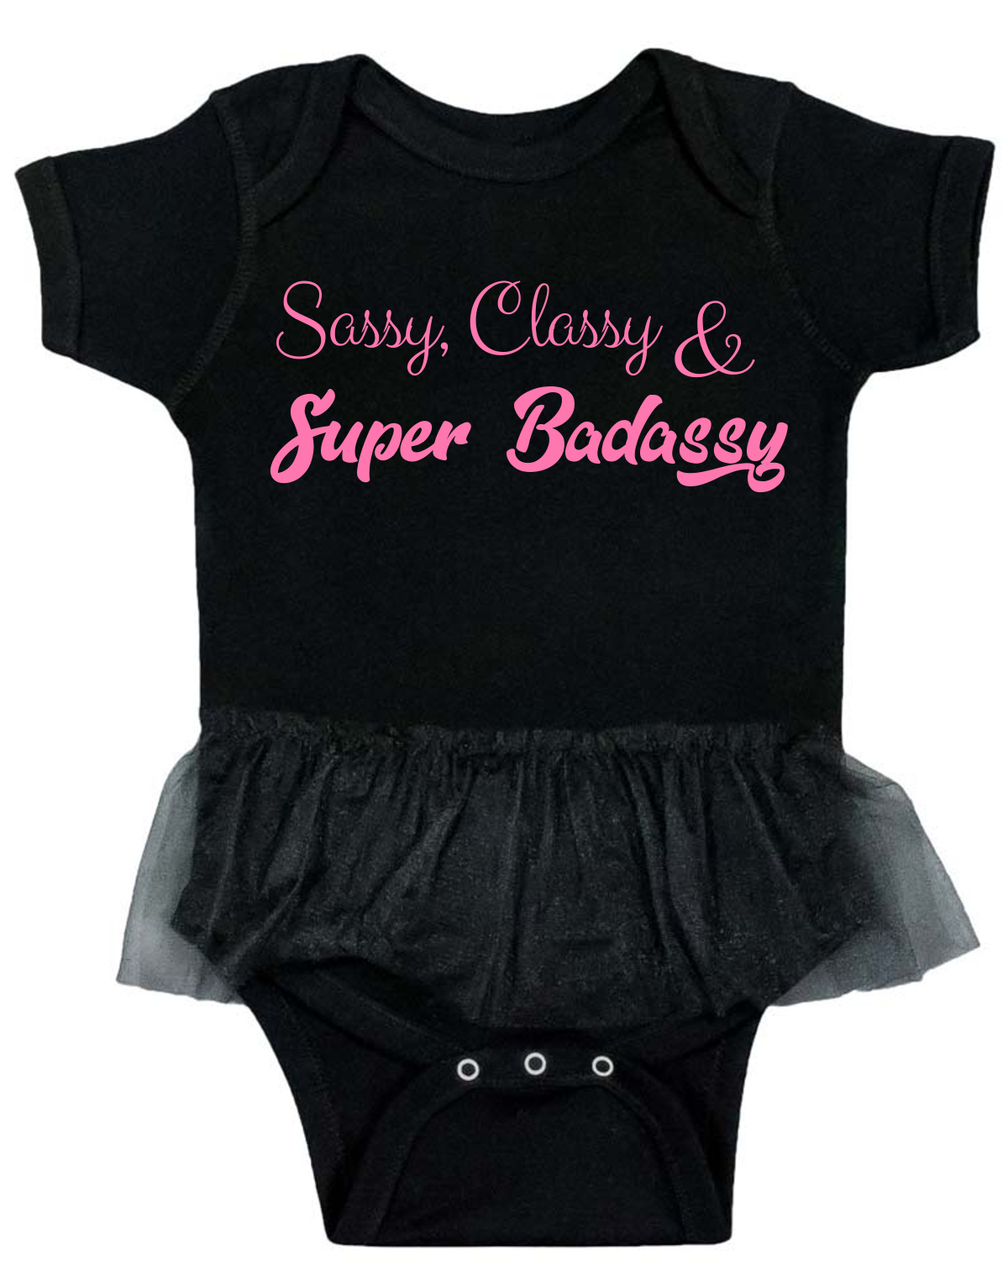 0cce2e6f Sassy baby tutu bodysuit, sassy classy and badassy, super badassy baby,  badass baby